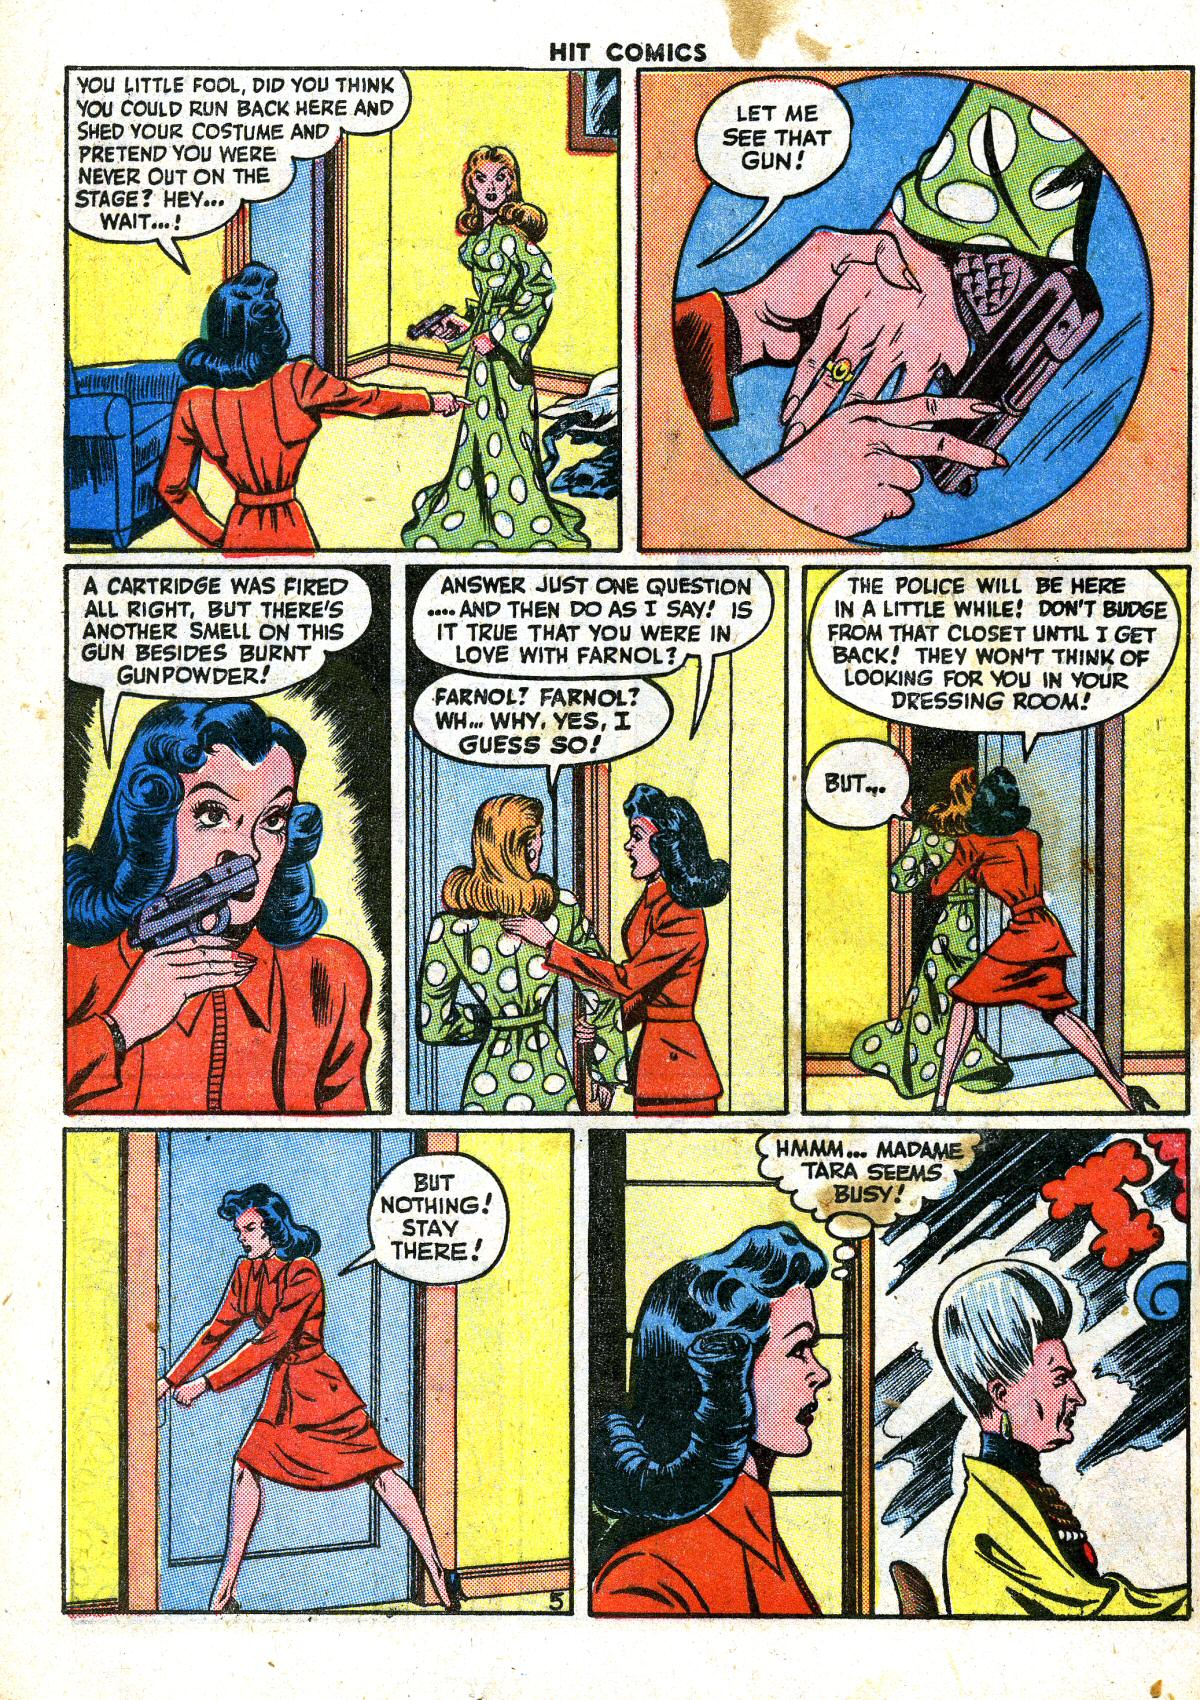 Read online Hit Comics comic -  Issue #41 - 34